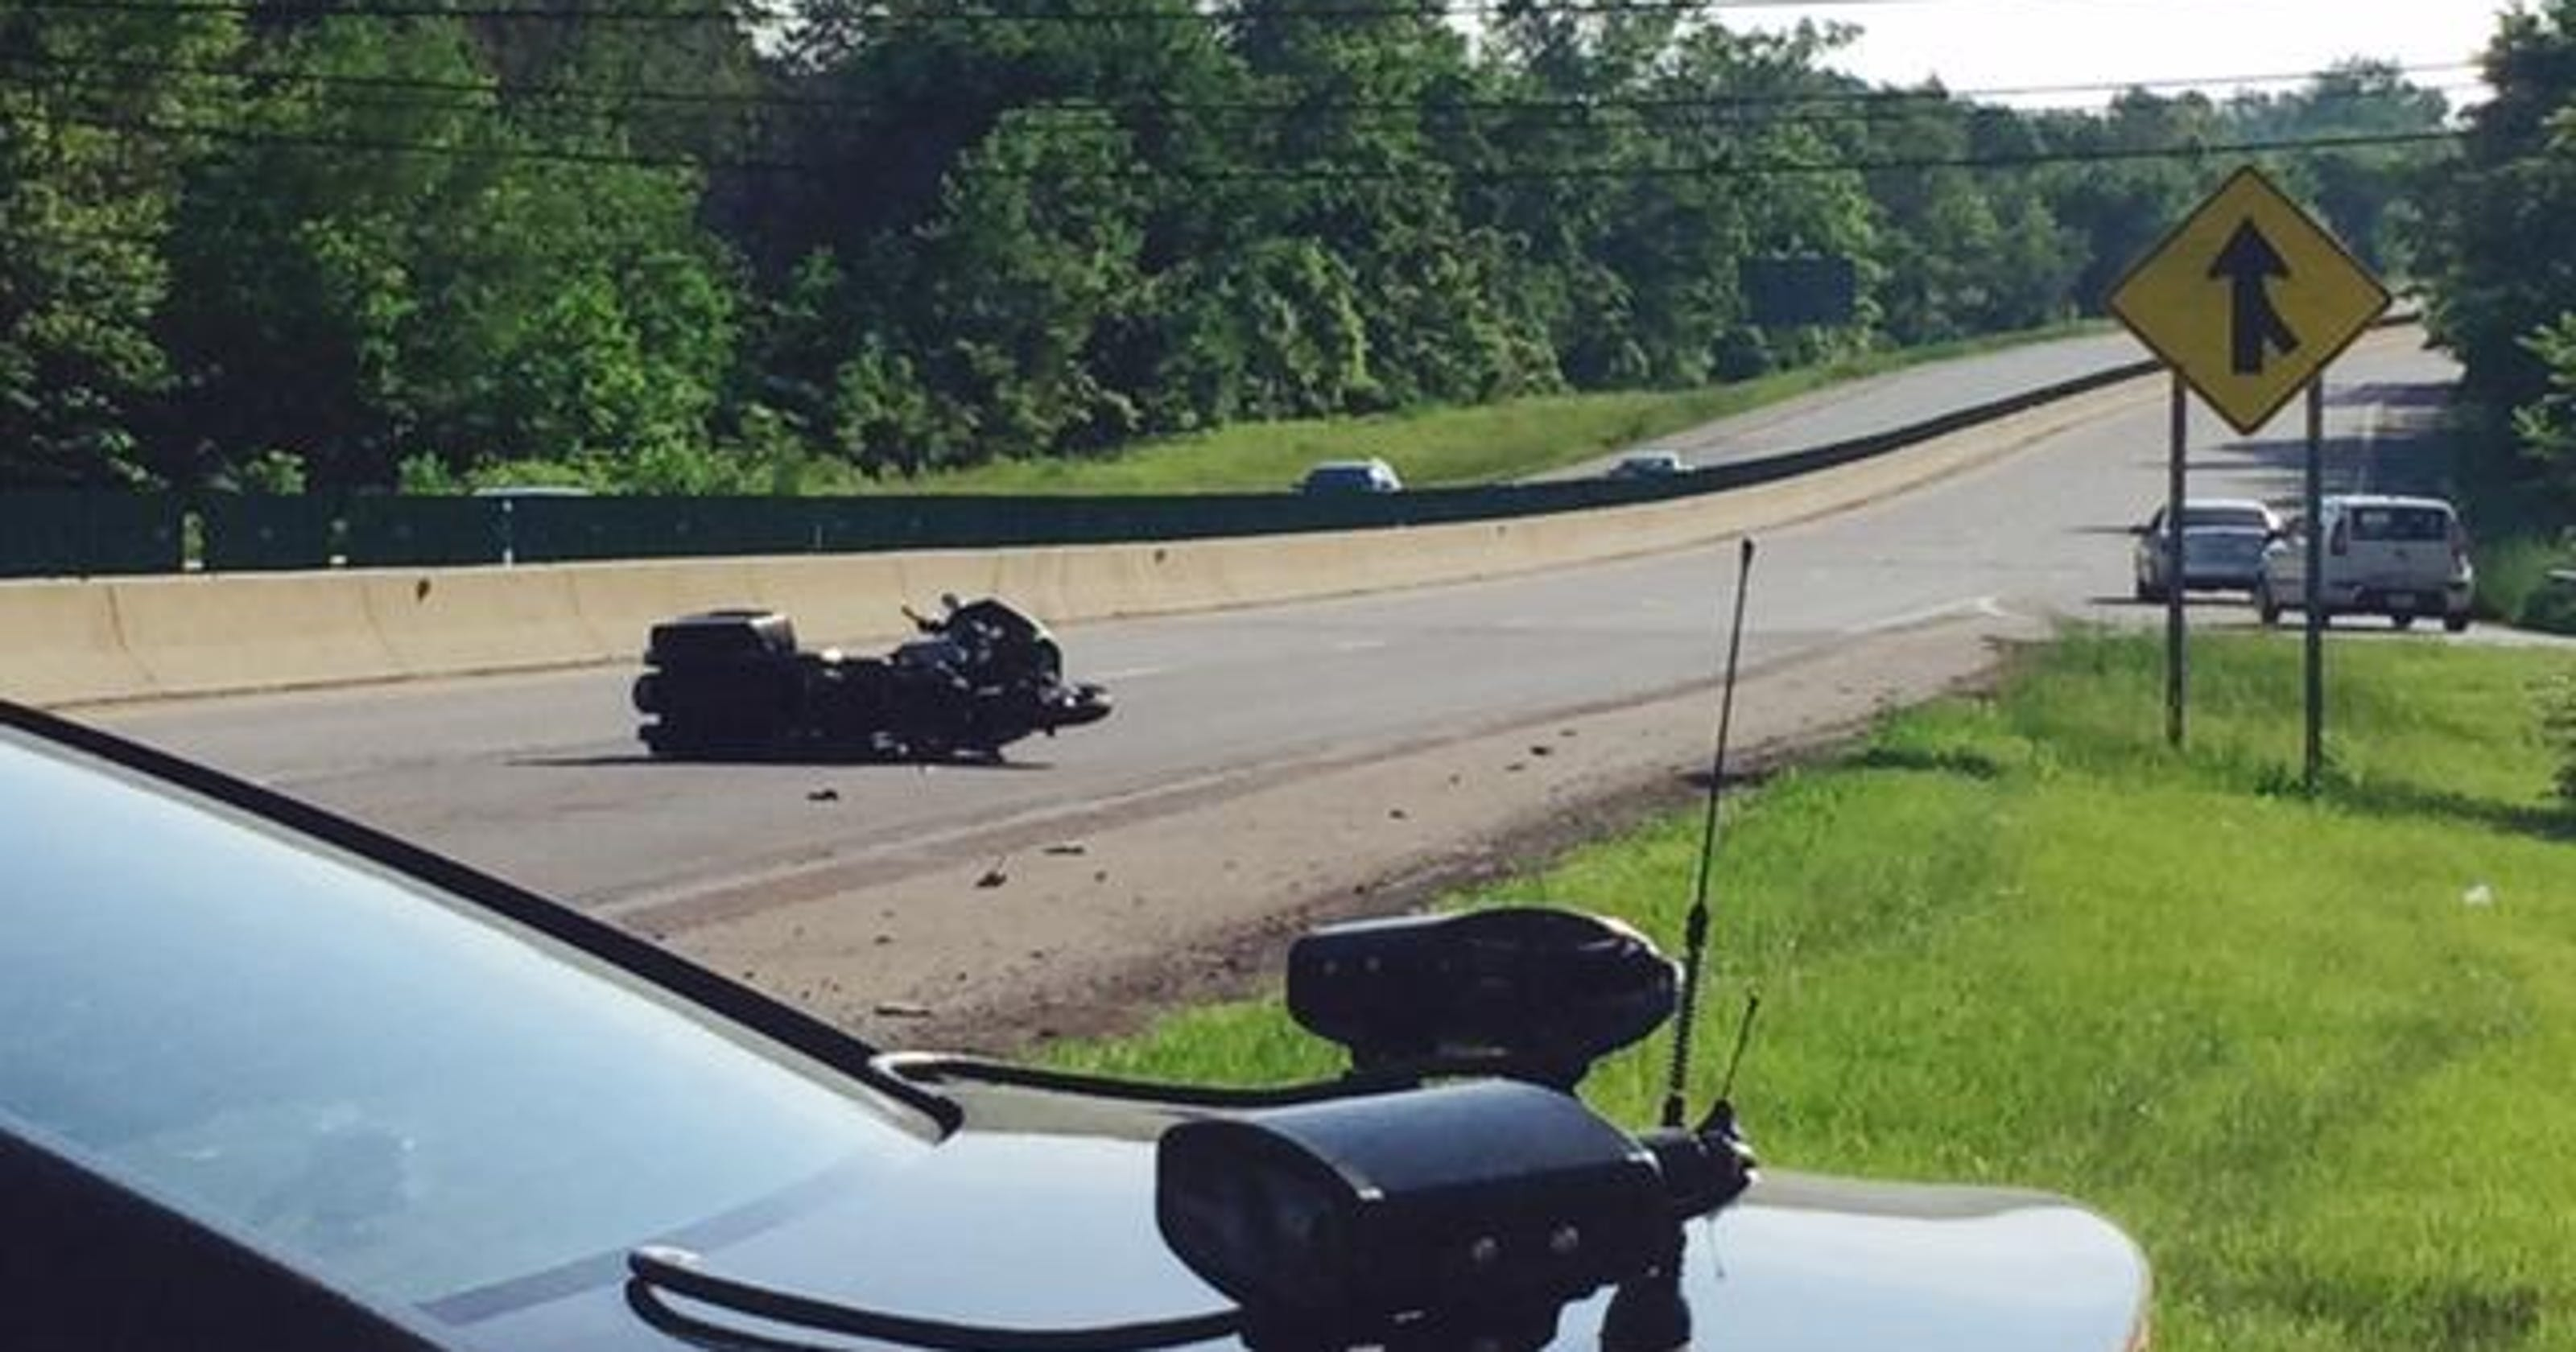 Two injured in motorcycle-deer crash shutting down U.S. 30